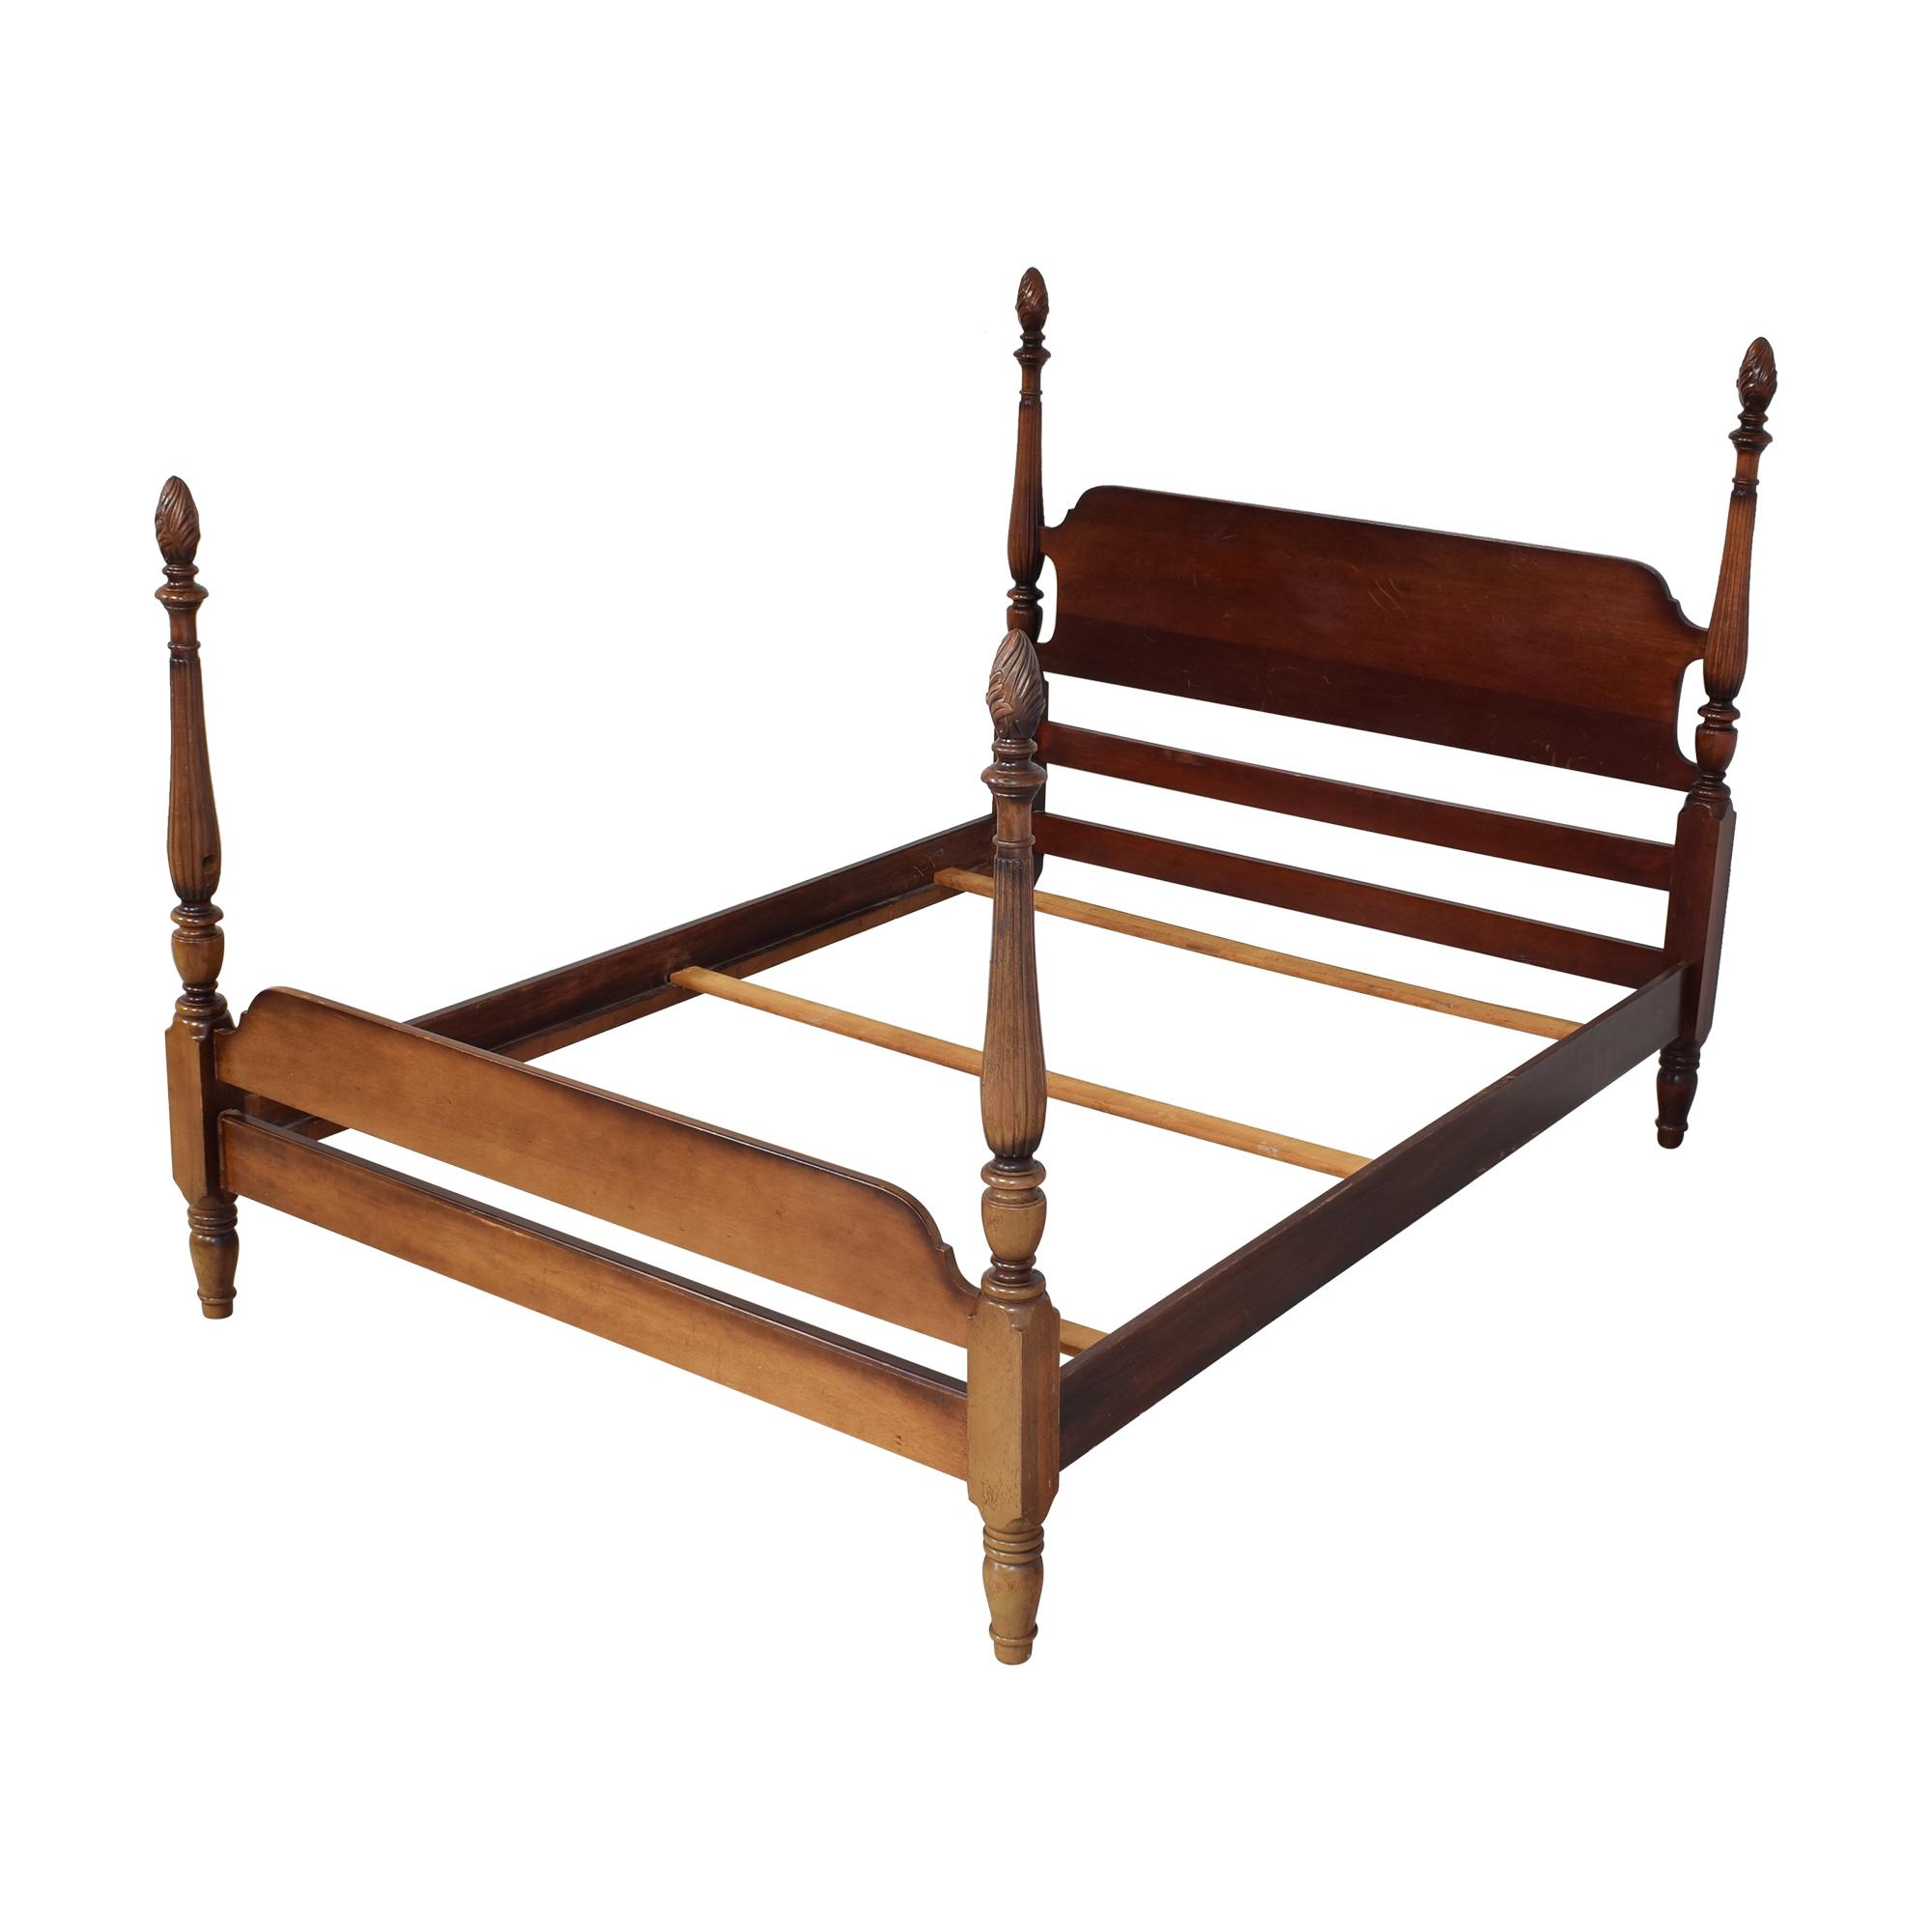 Kling Kling Four Post Full Bed Beds